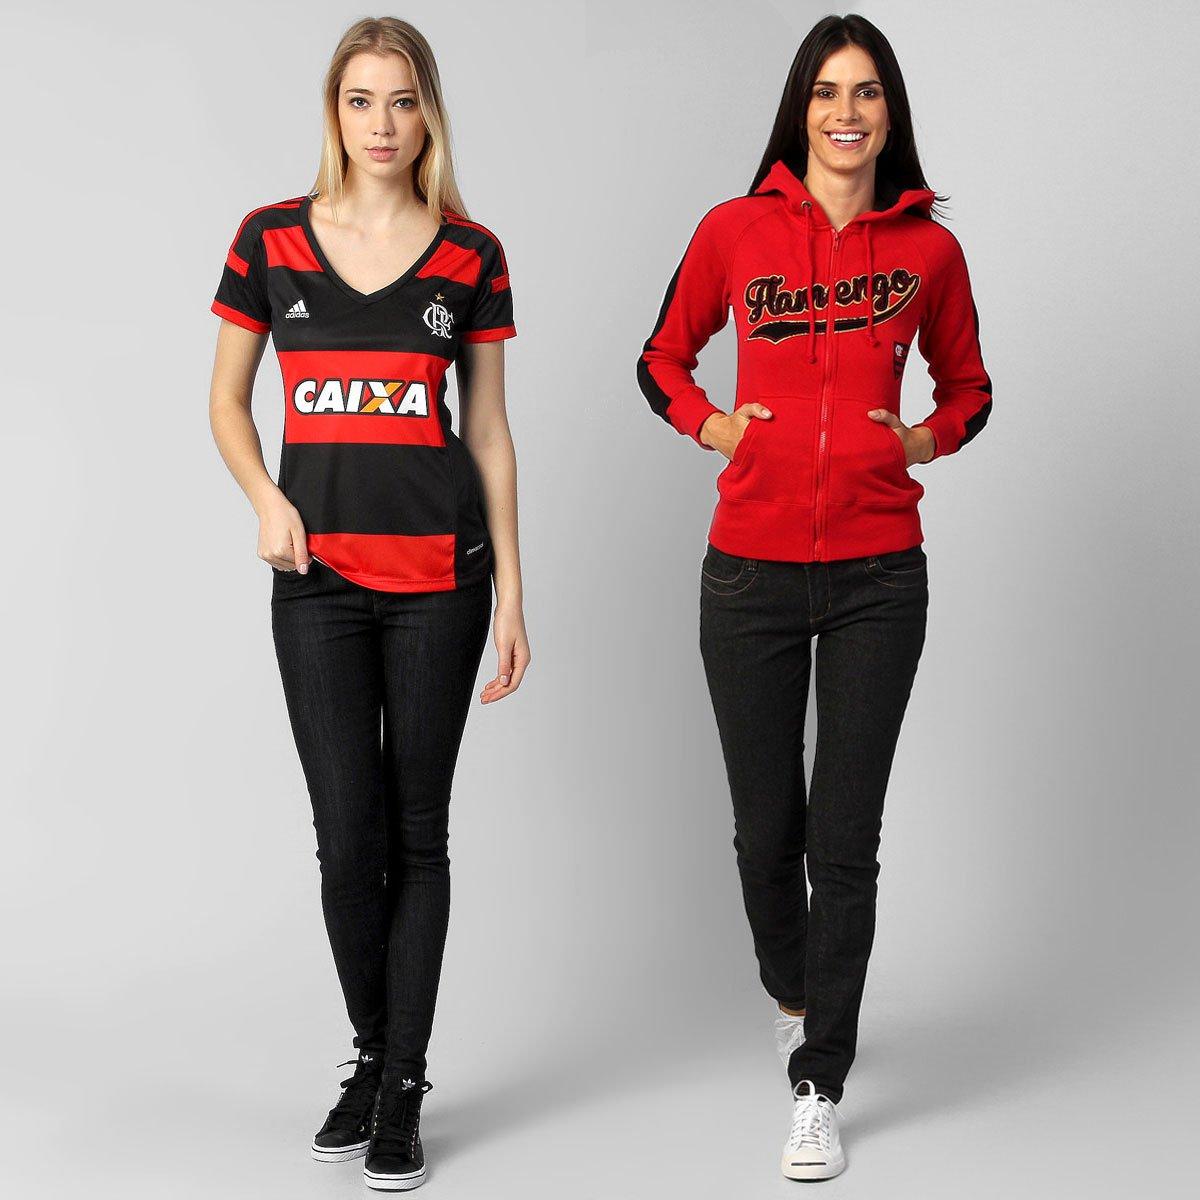 Kit Feminino Flamengo - Camisa Feminina Adidas Flamengo I 14 15 + Jaqueta -  Compre Agora  0e1174b57f73e